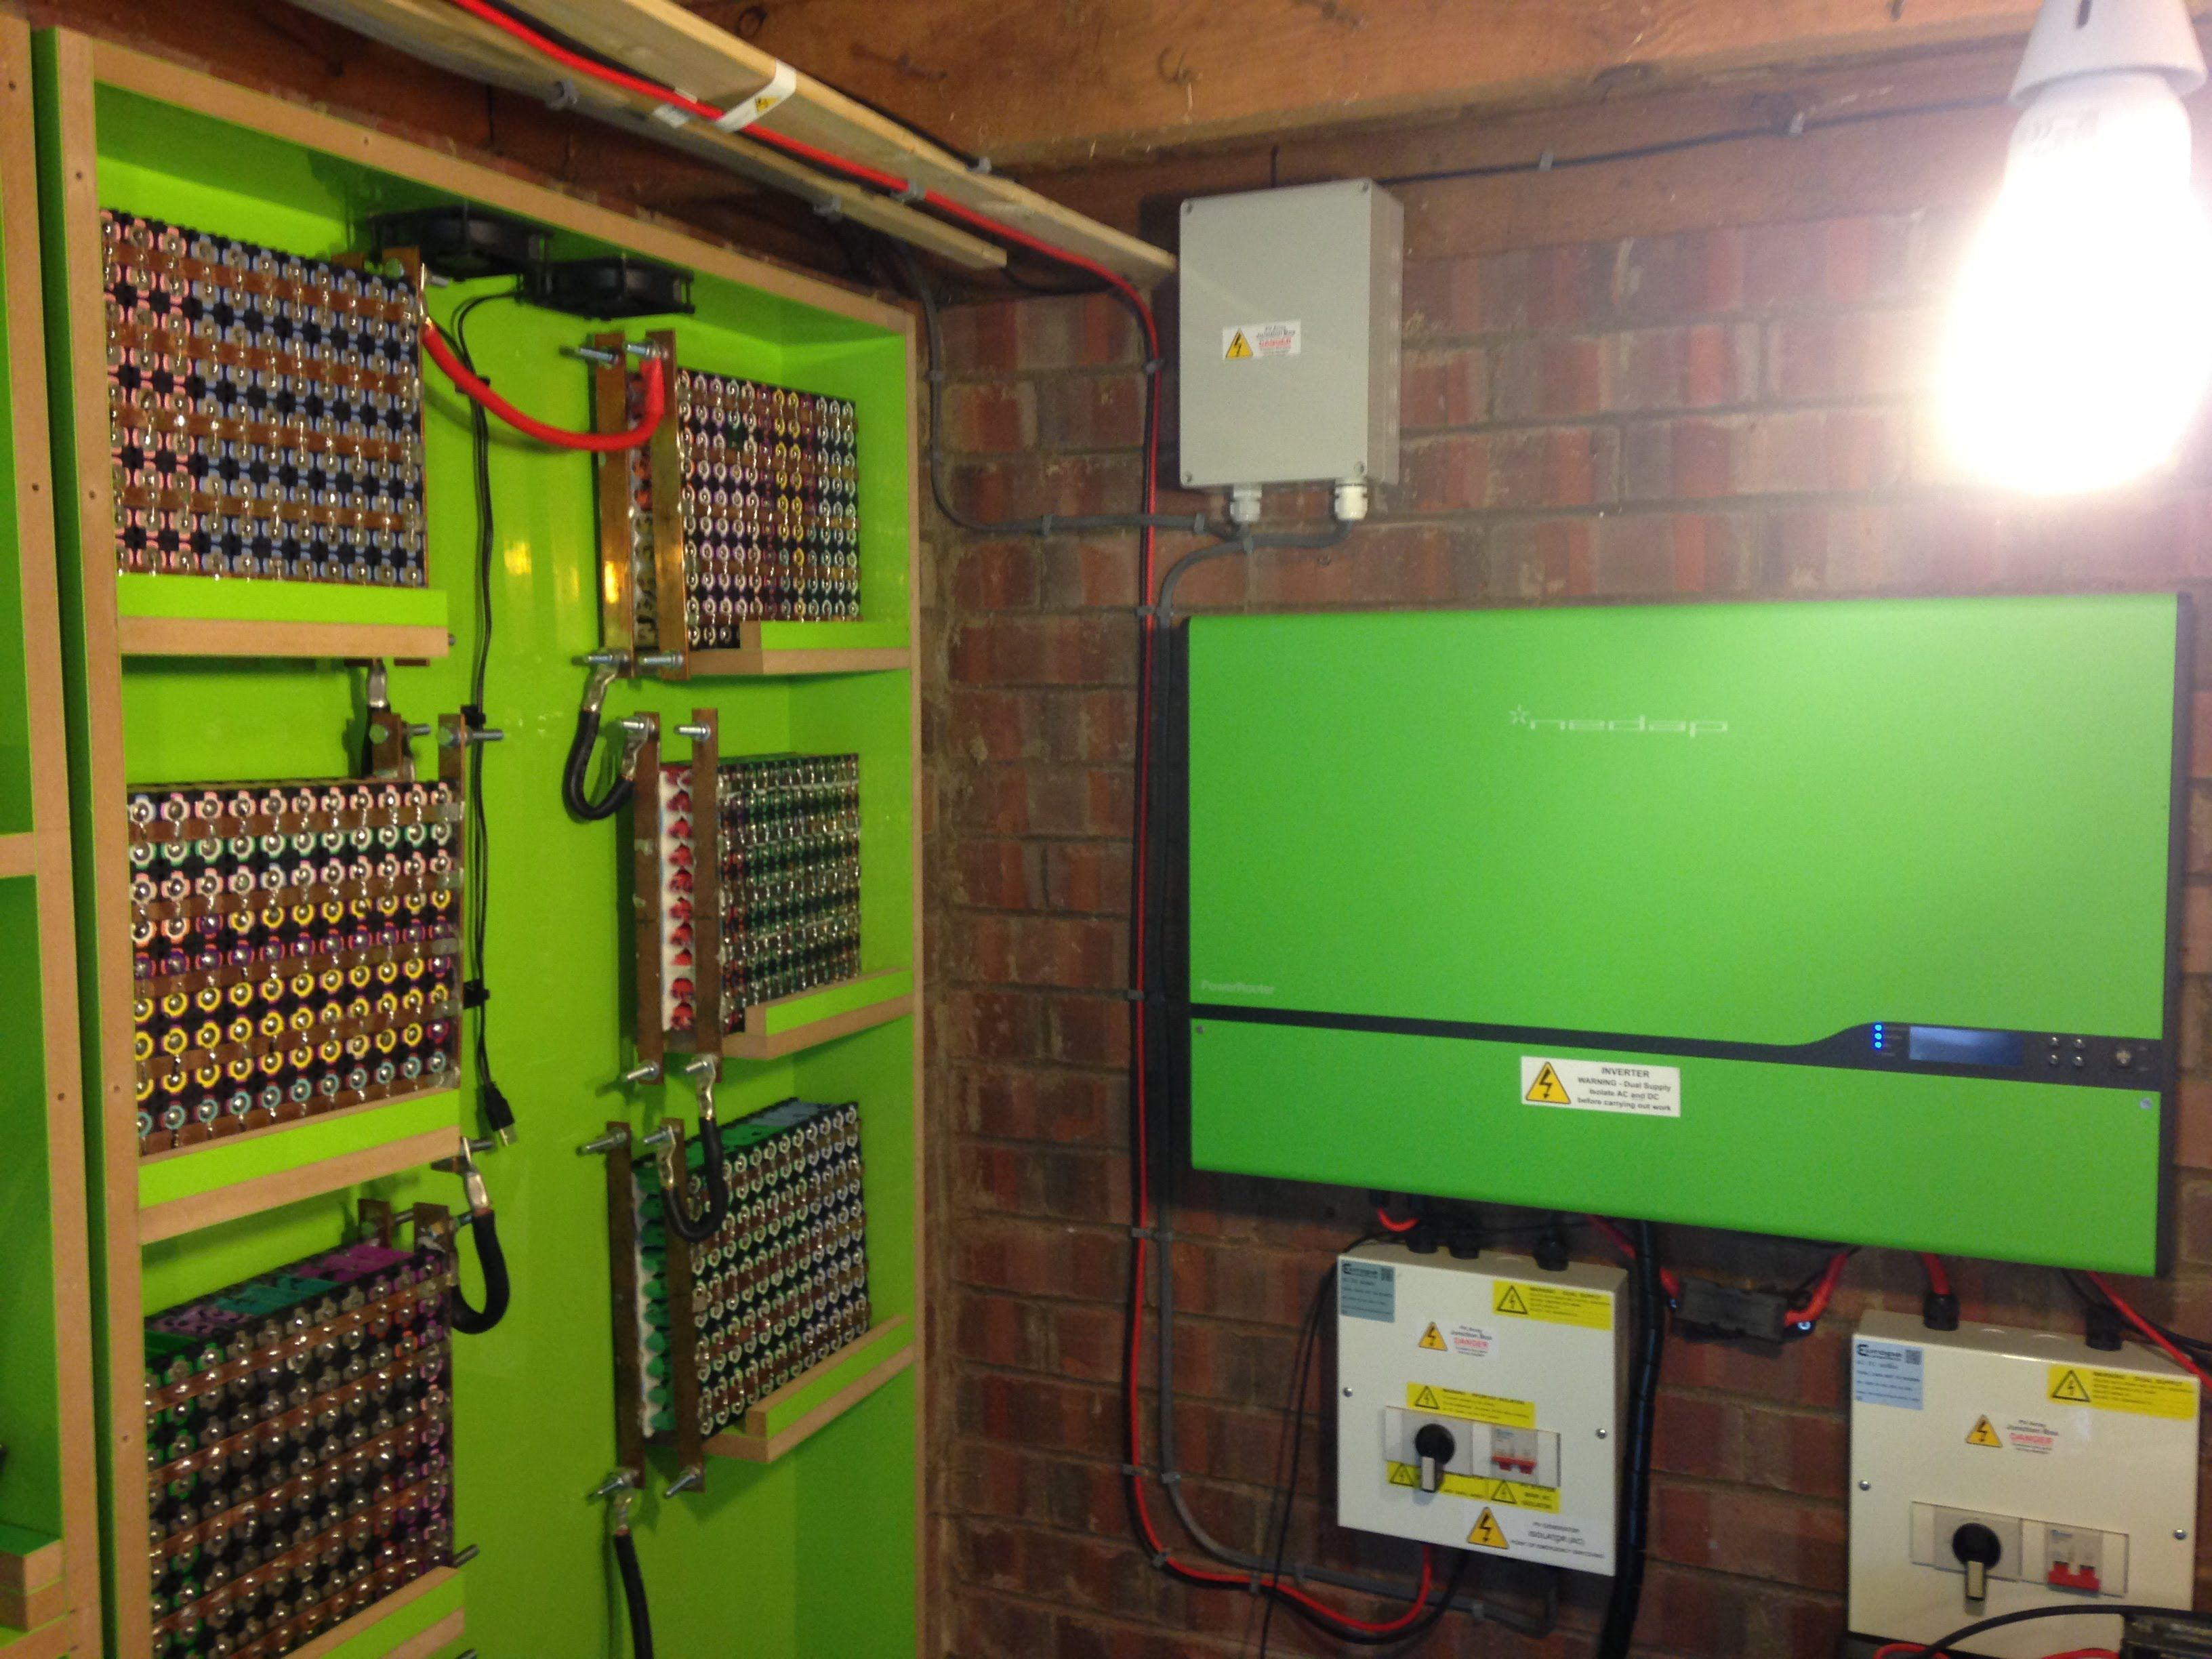 Uk Diy Powerwall How To Build A 900 600 Tesla Style Powerwall Ho Powerwall Tesla Powerwall Green Energy